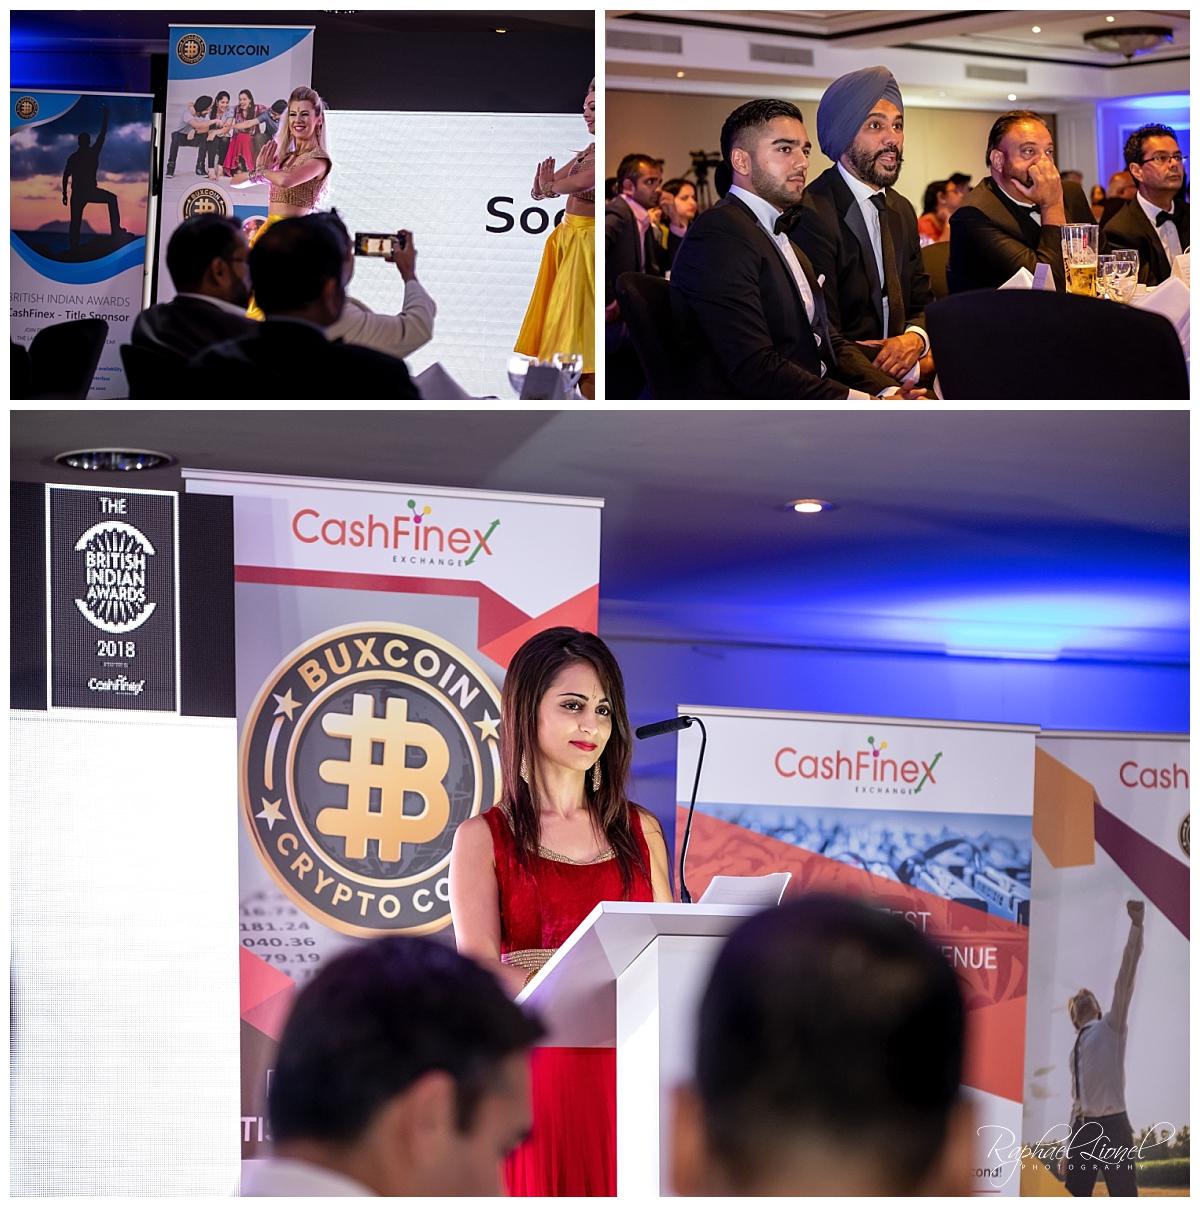 British Indian Awards 2018 8 - British Indian Awards 2018 St Johns Hotel